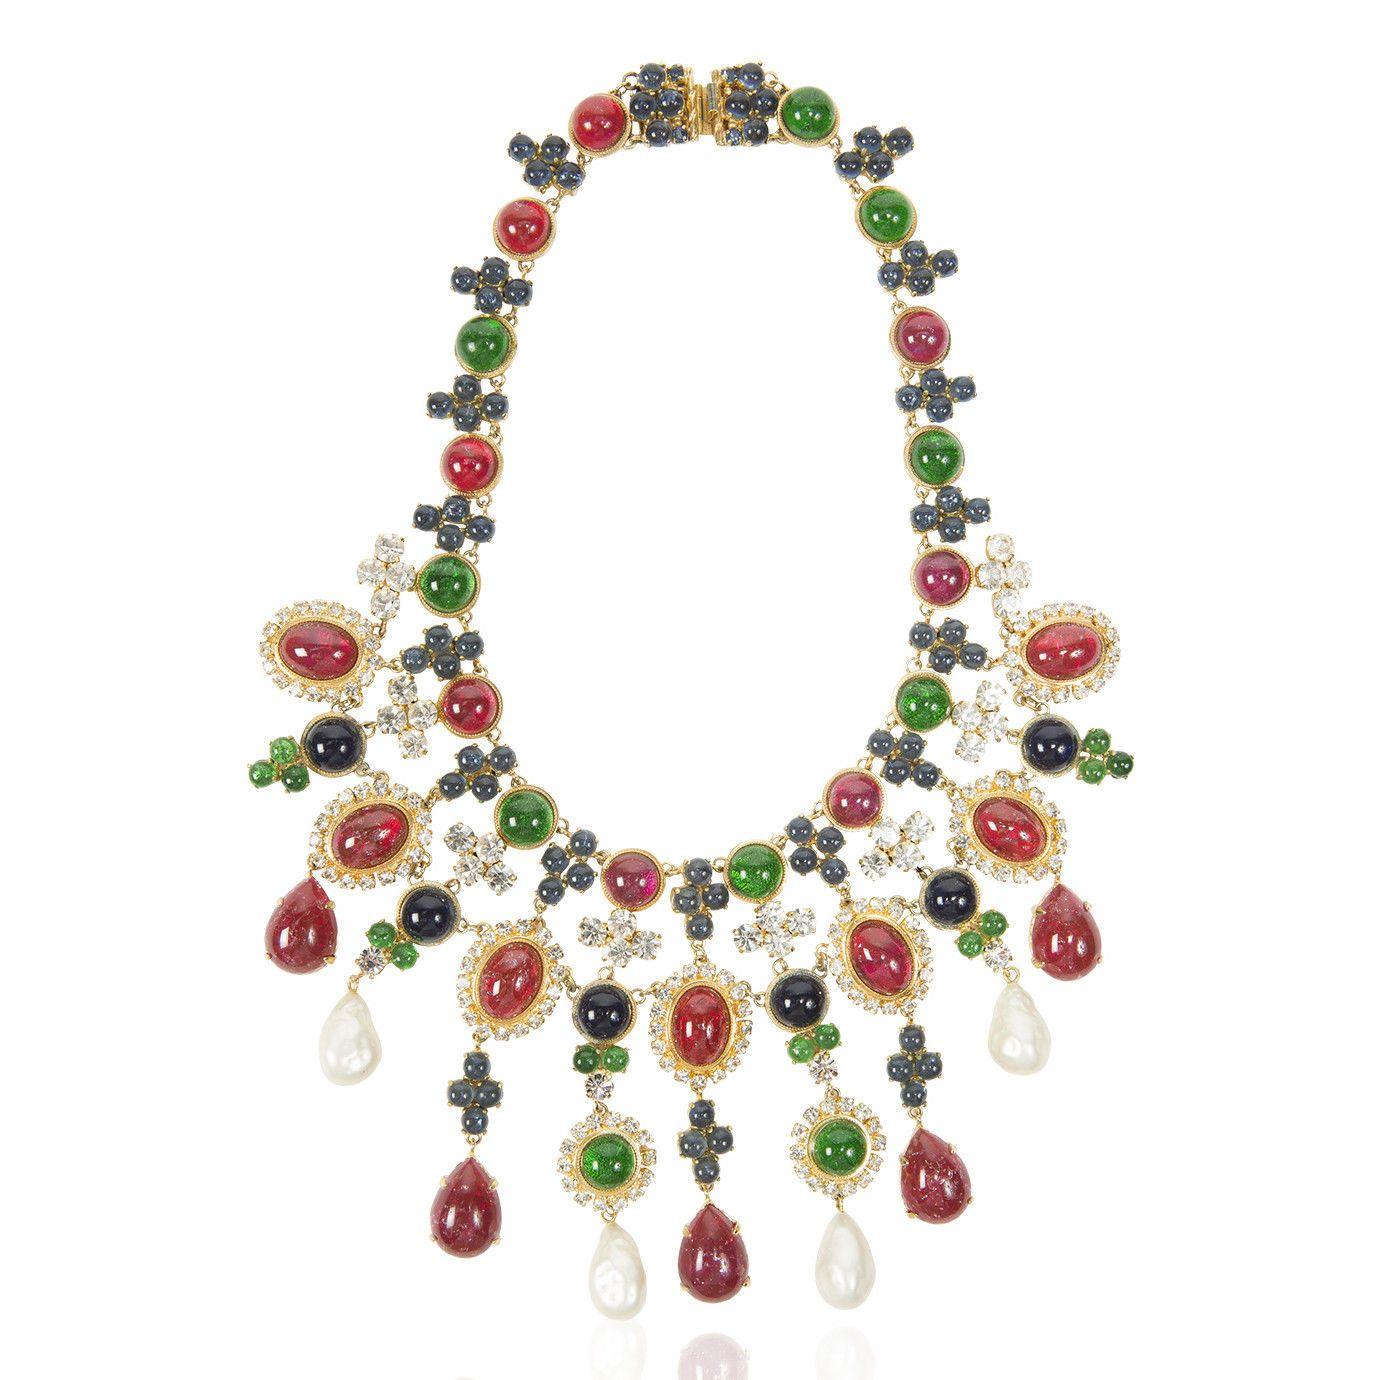 Christian Dior Elaborate Ruby Emerald Paste Pearl Bib Necklace